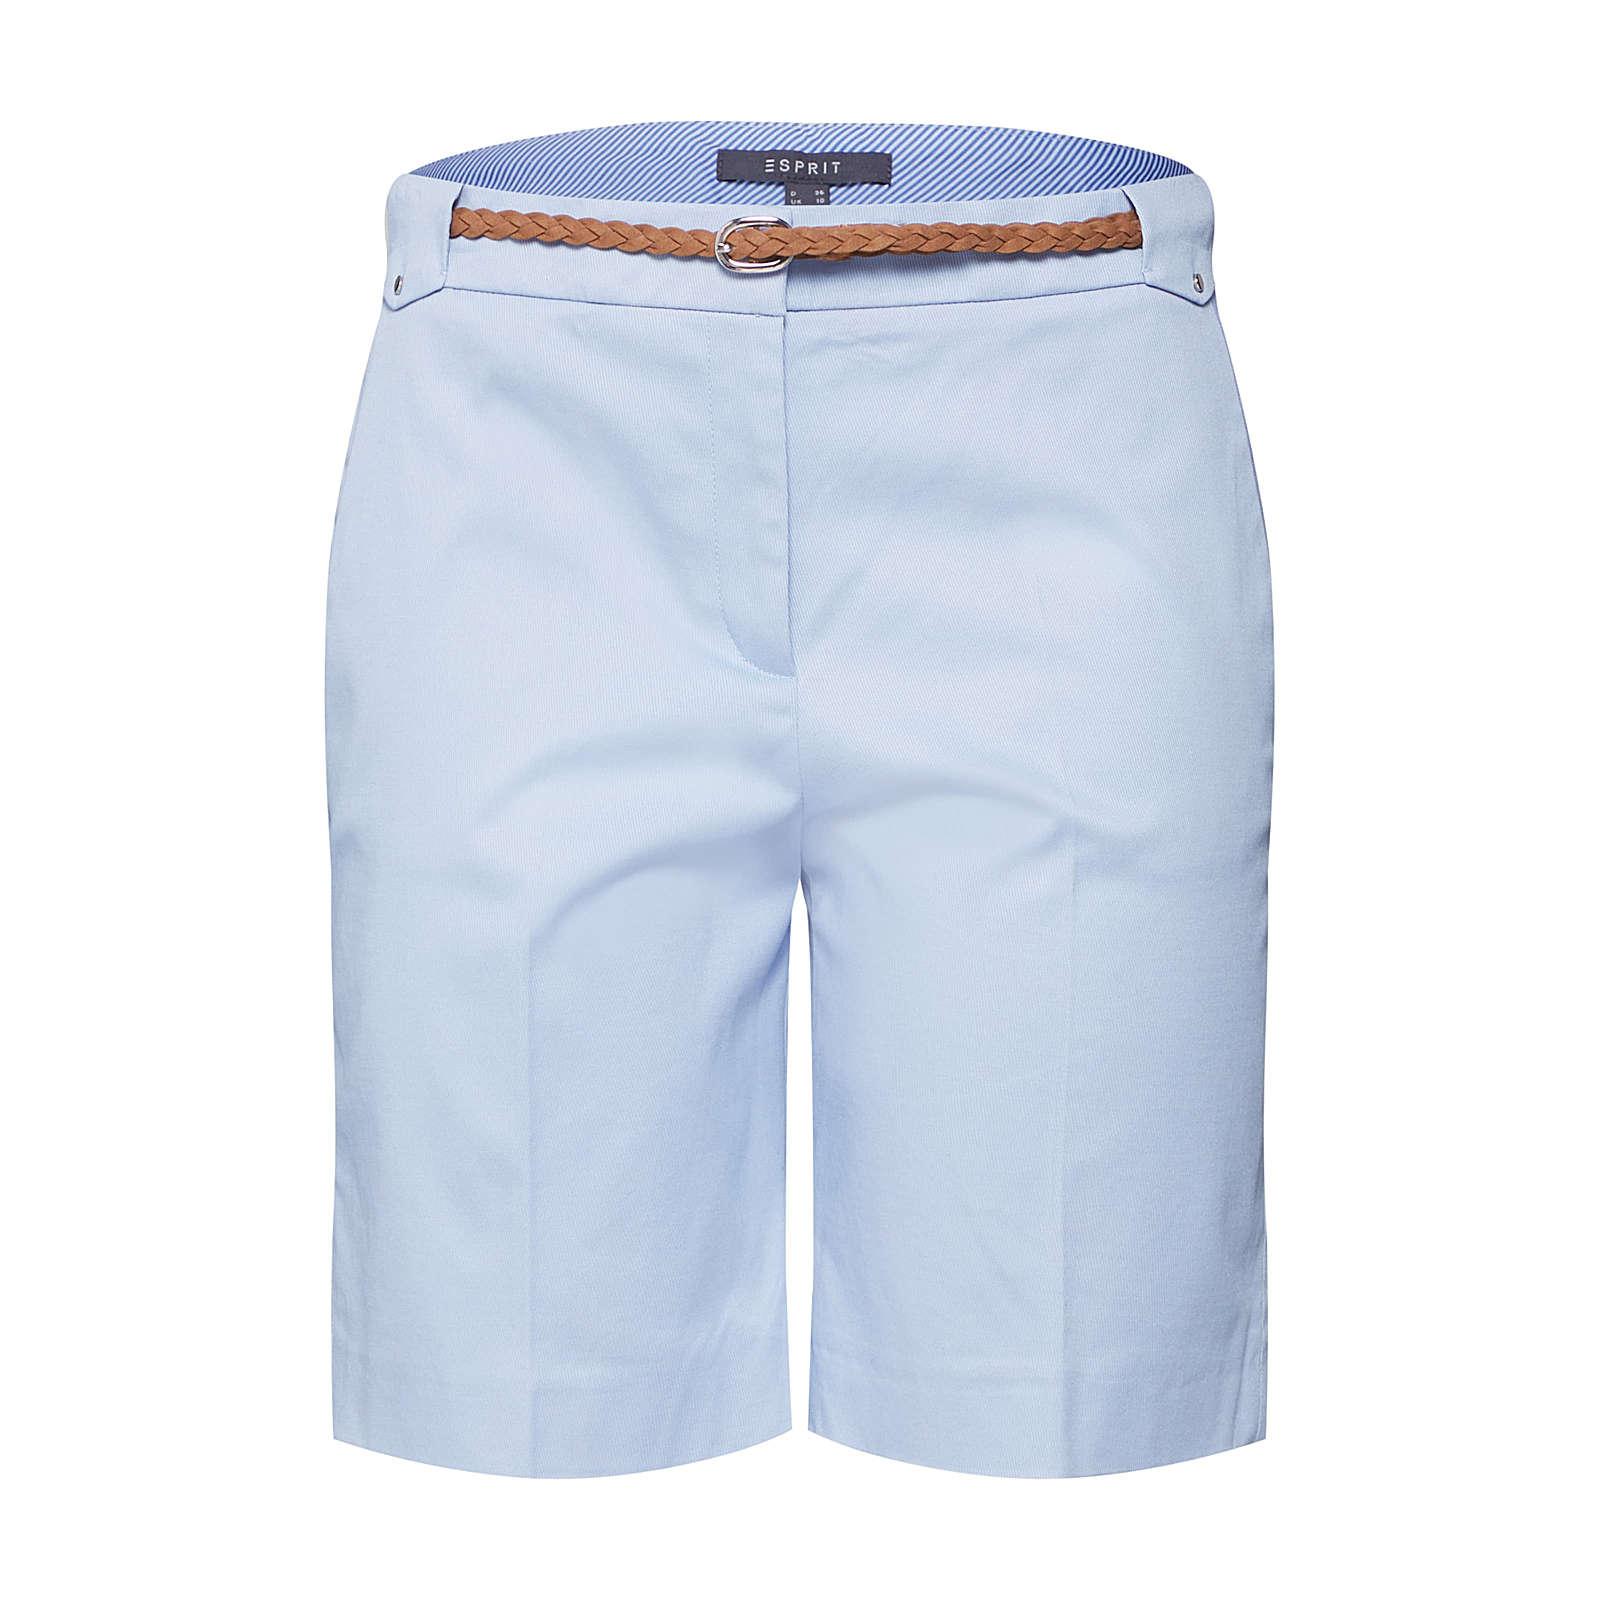 Esprit Collection Bügelfaltenhose Stoffhosen hellblau Damen Gr. 40